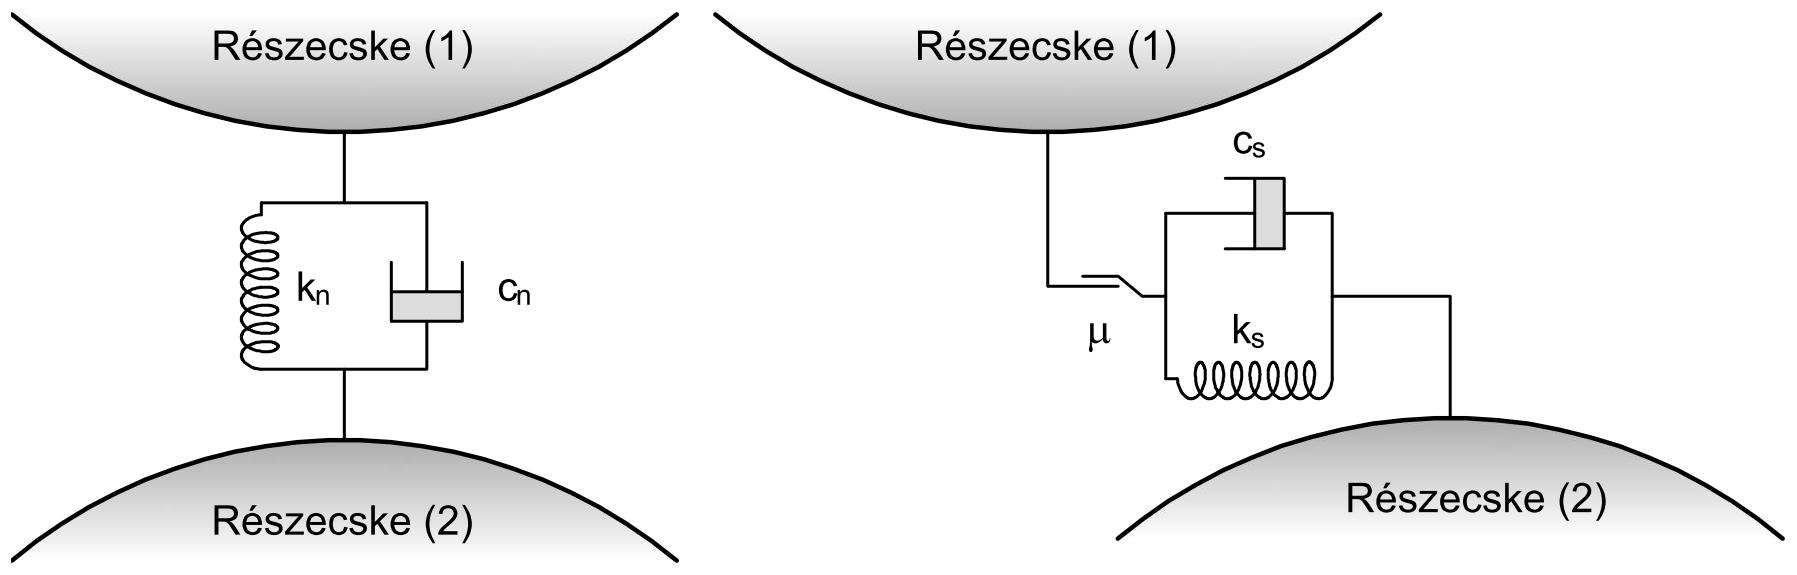 8_particle-model3